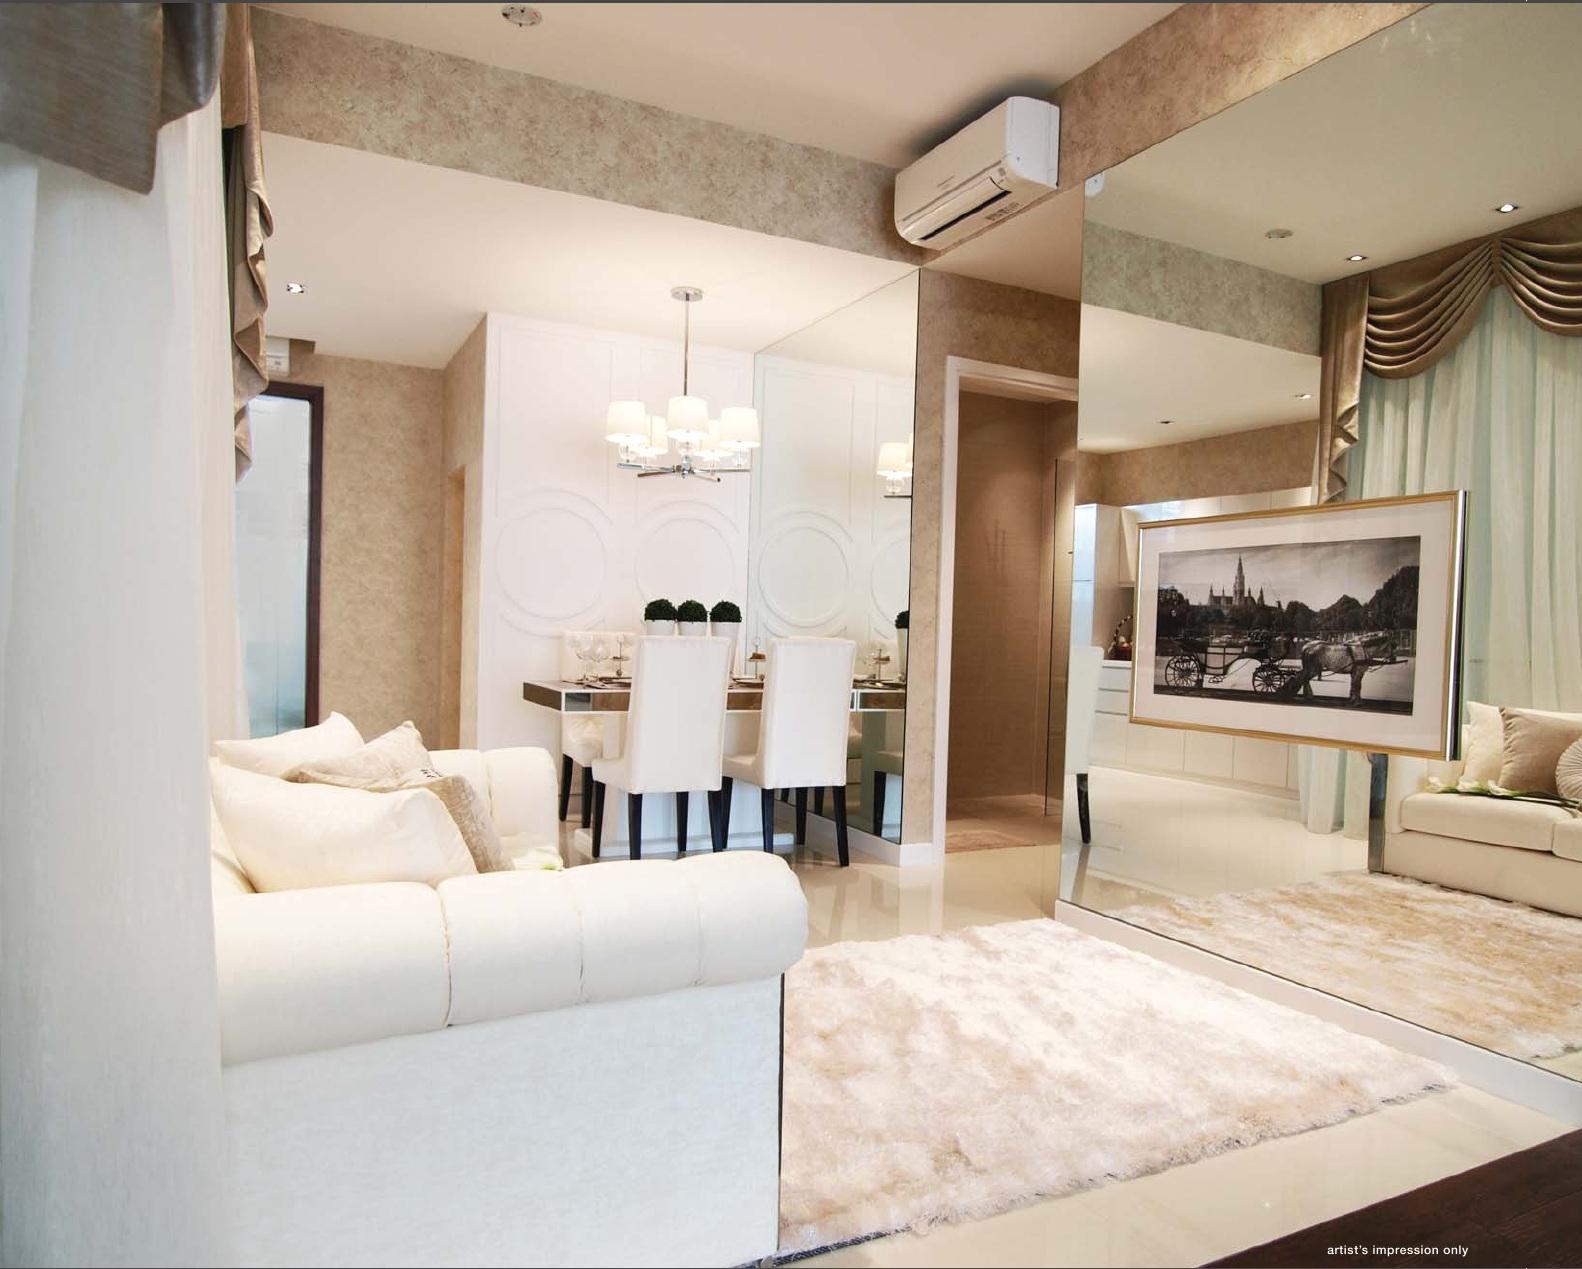 Regent-Residences living regent residences Regent Residences Singapore | Showflat Hotline +65 61007122 regent residences181